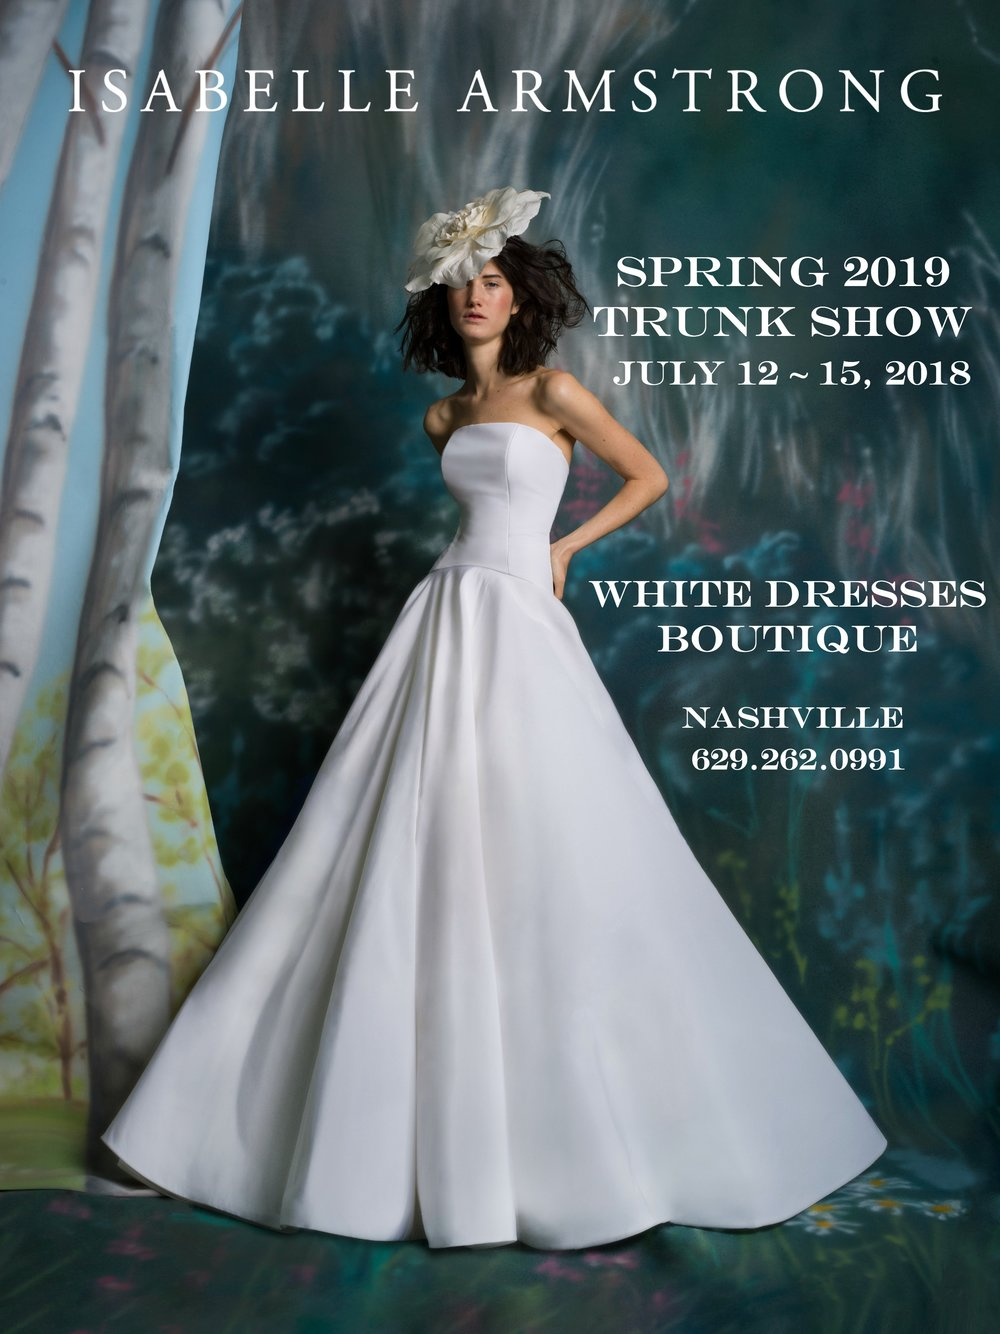 IA TS - WHITE DRESSES 7-12-18.jpg